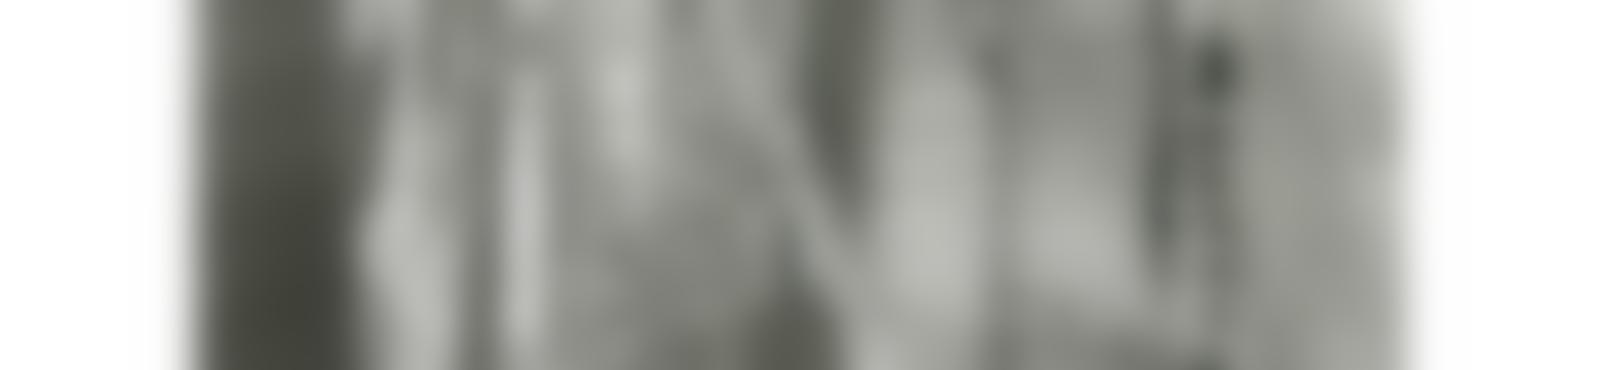 Blurred 238ca6aa cfd8 479e 8112 8b8ba7bd52d5